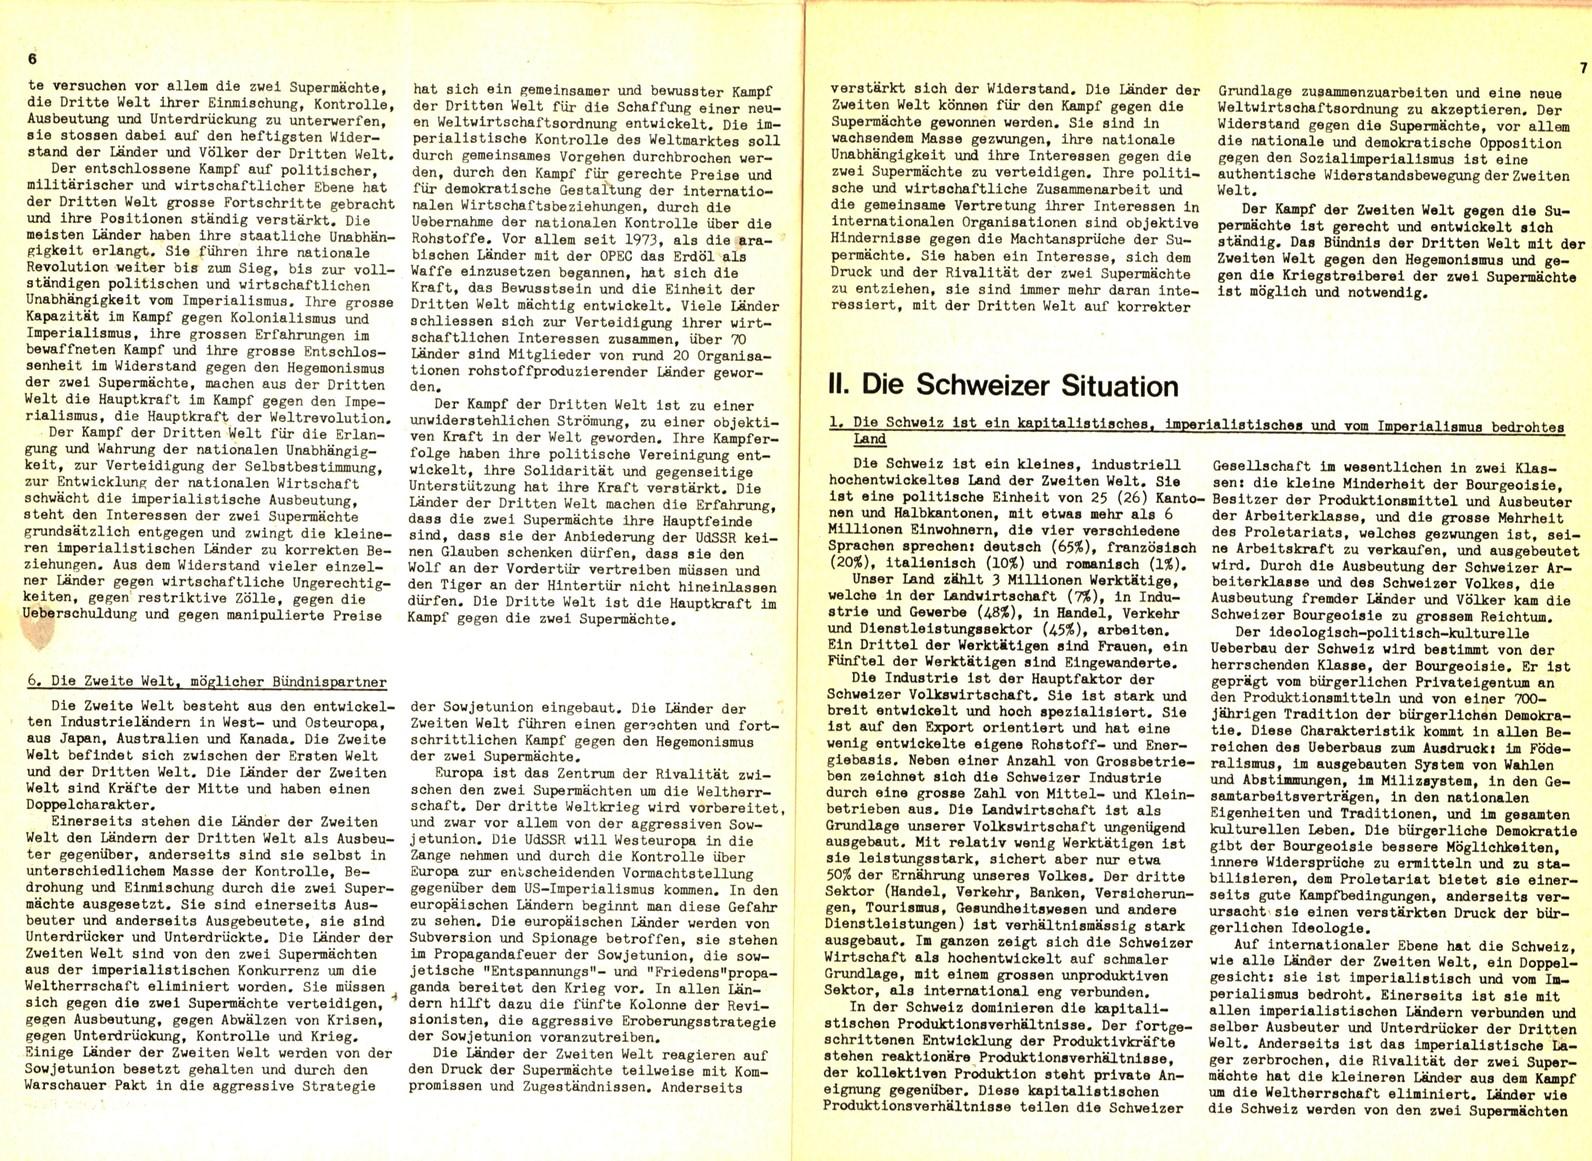 Schweiz_KPSML_Oktober_19780100_118_004